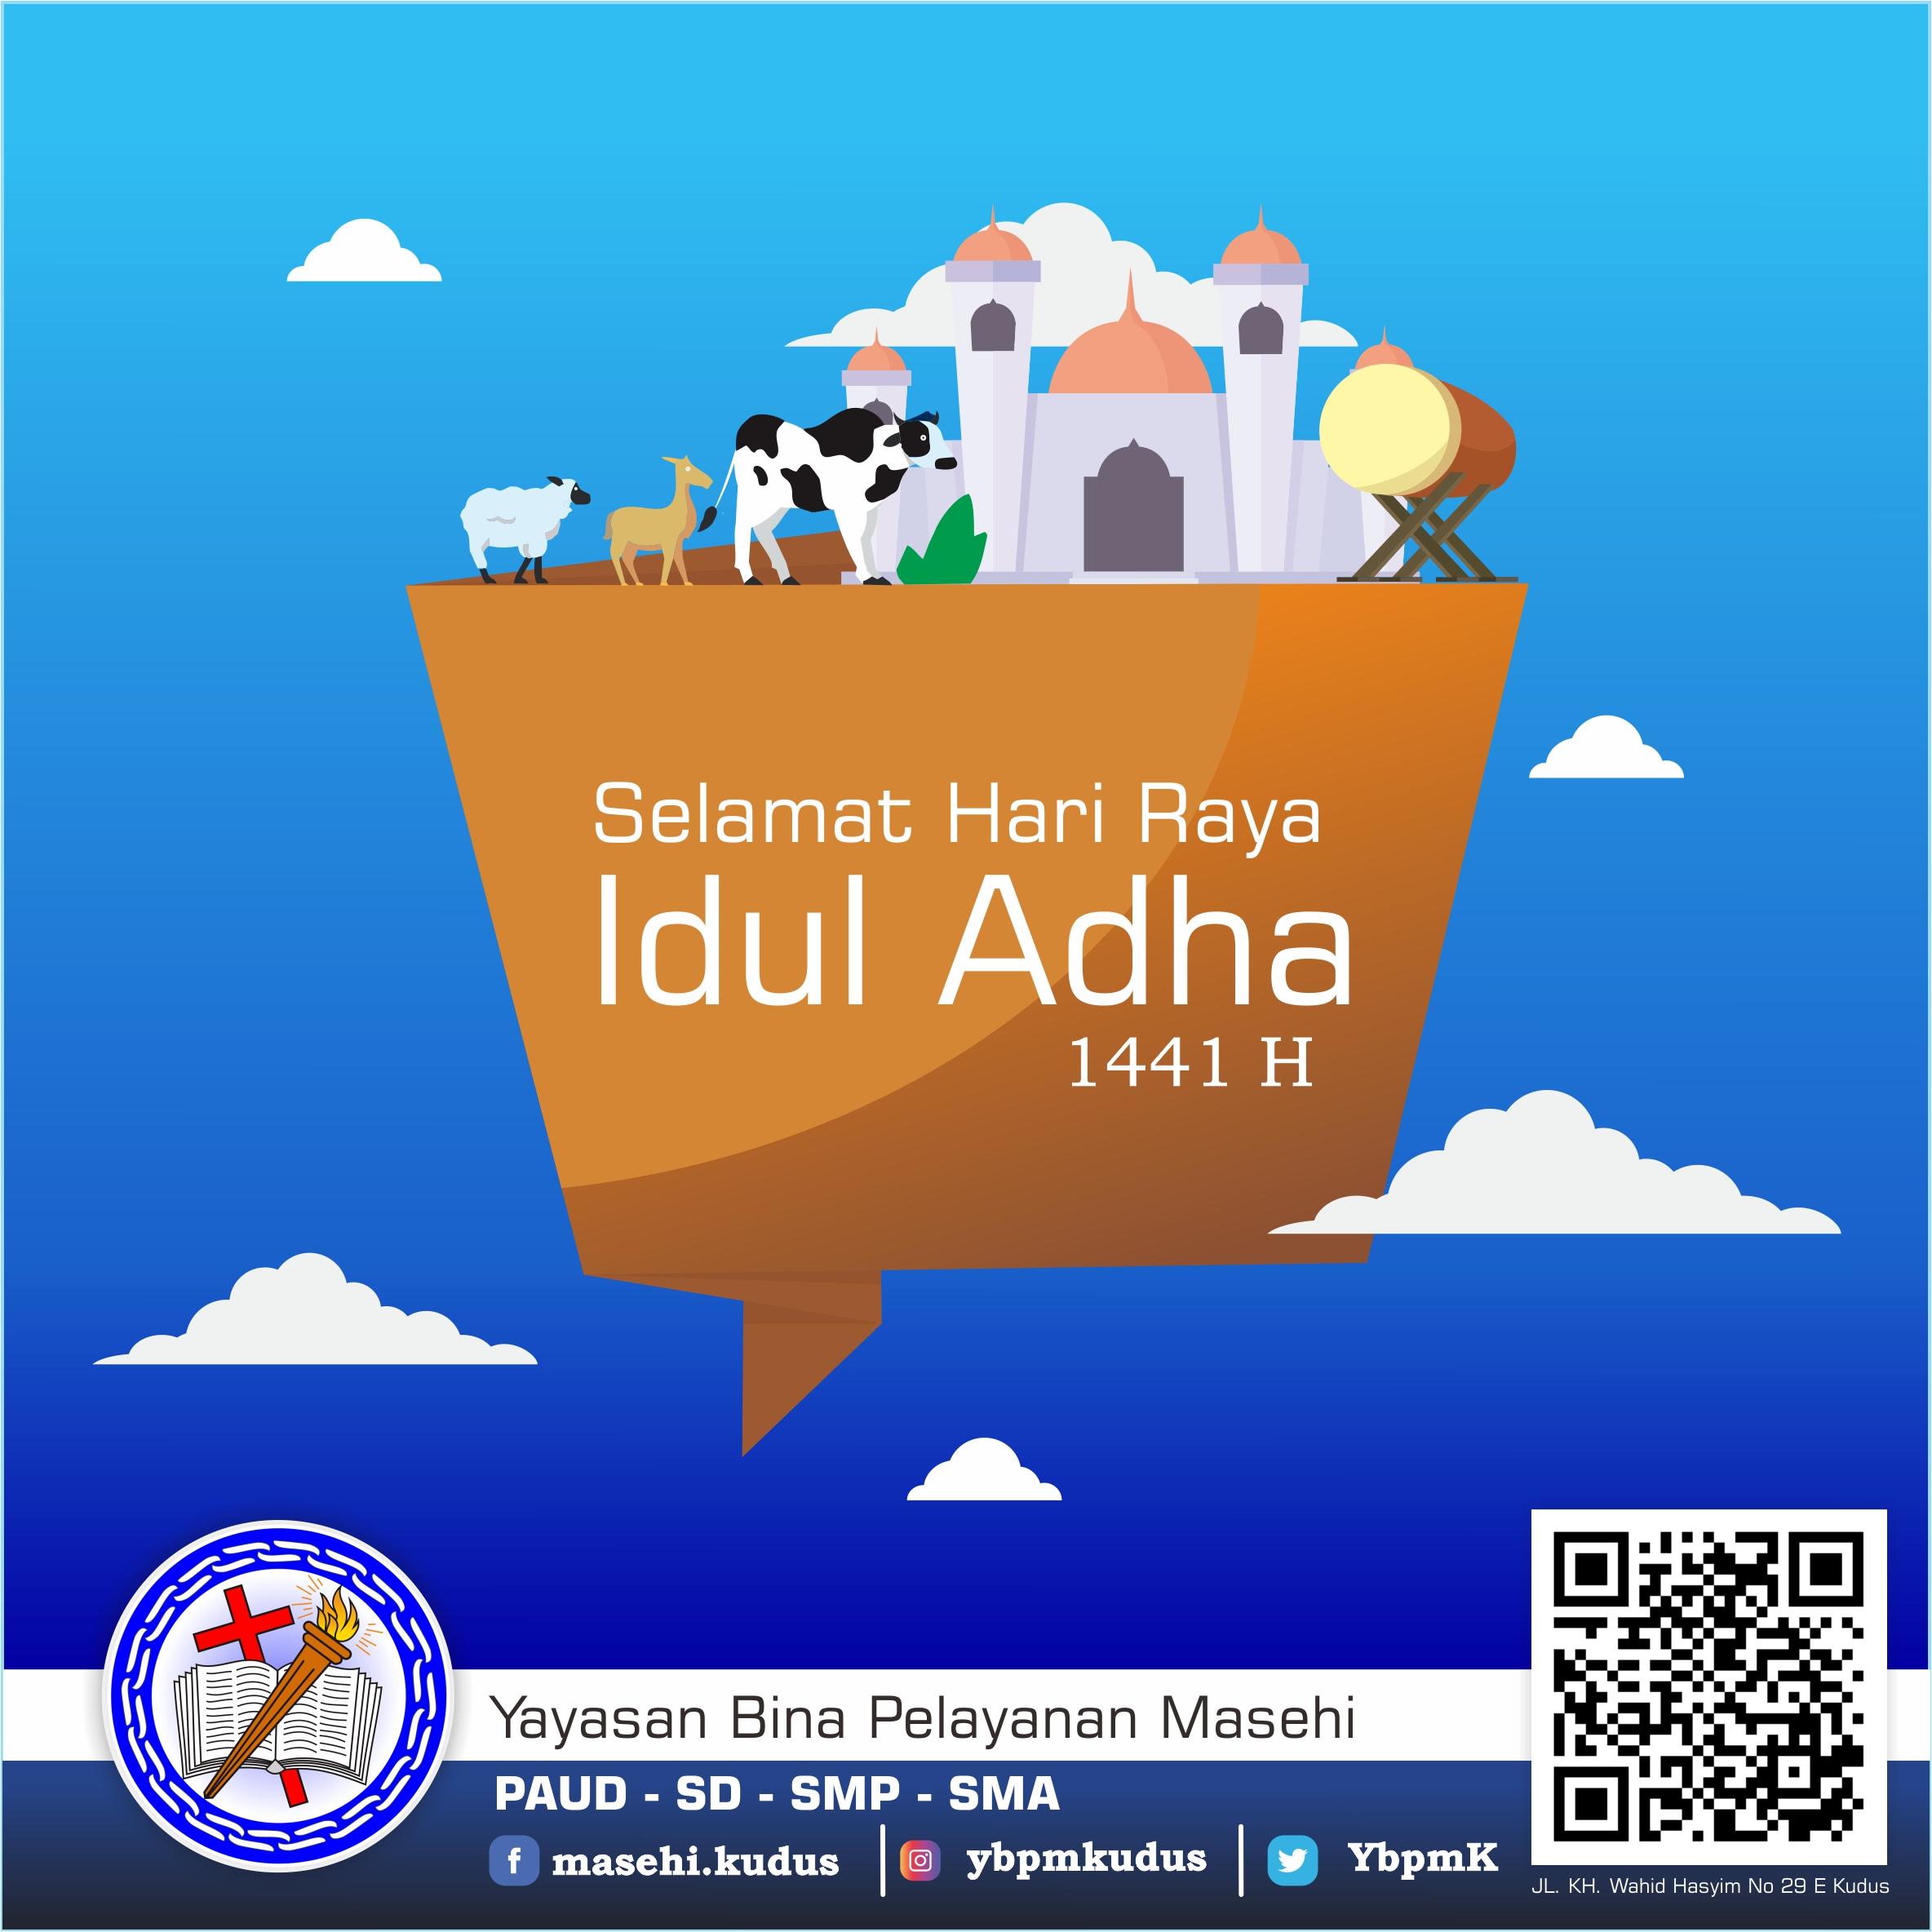 Selamat Hari Raya Idul Adha